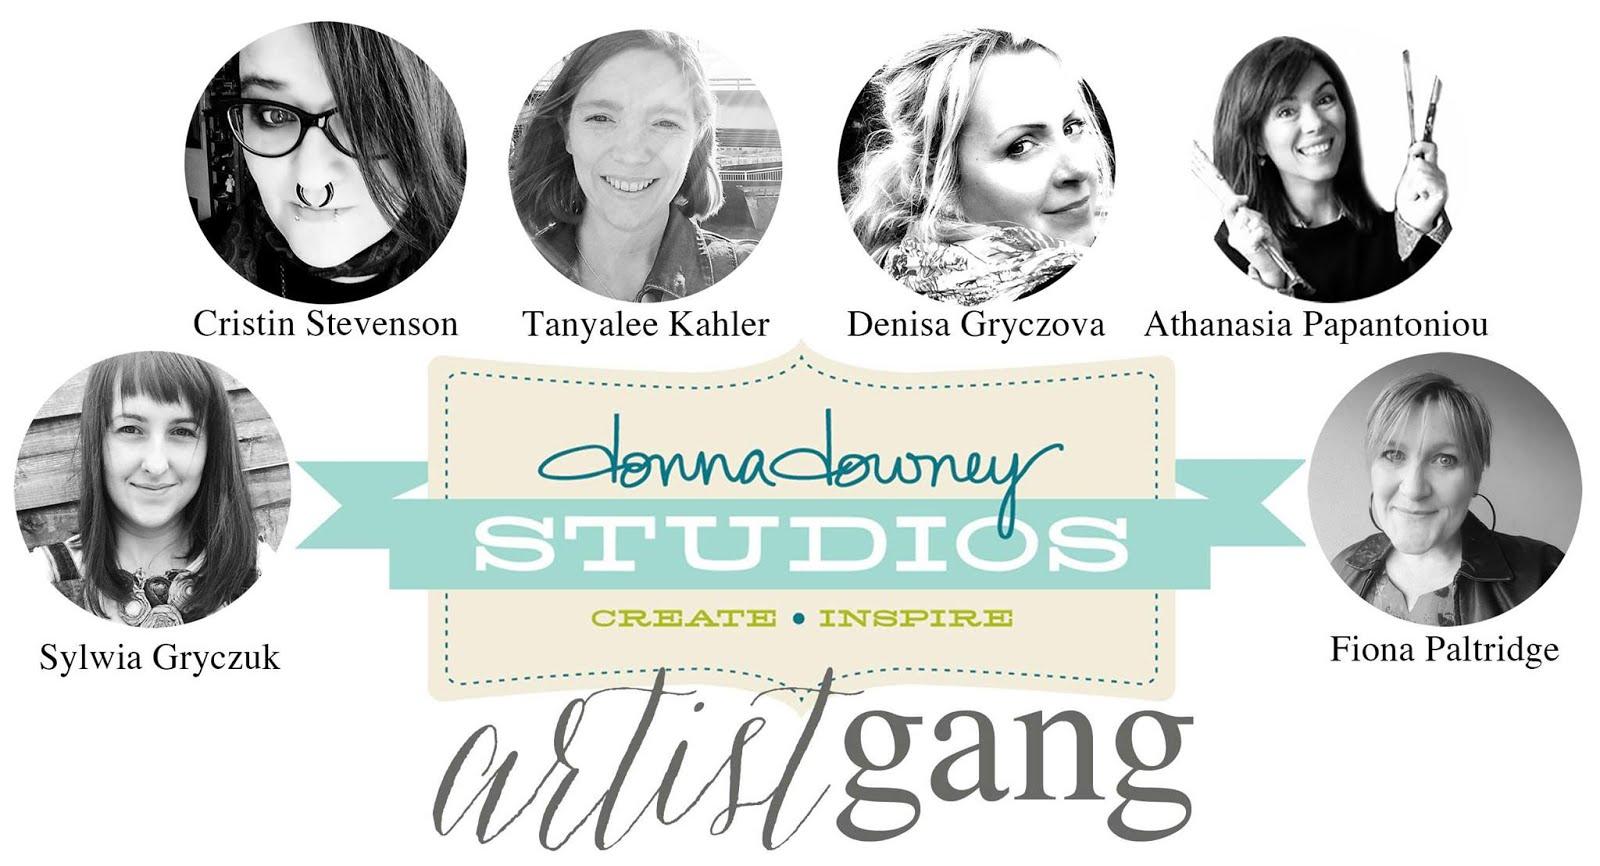 Donna Downey's Artist Gang